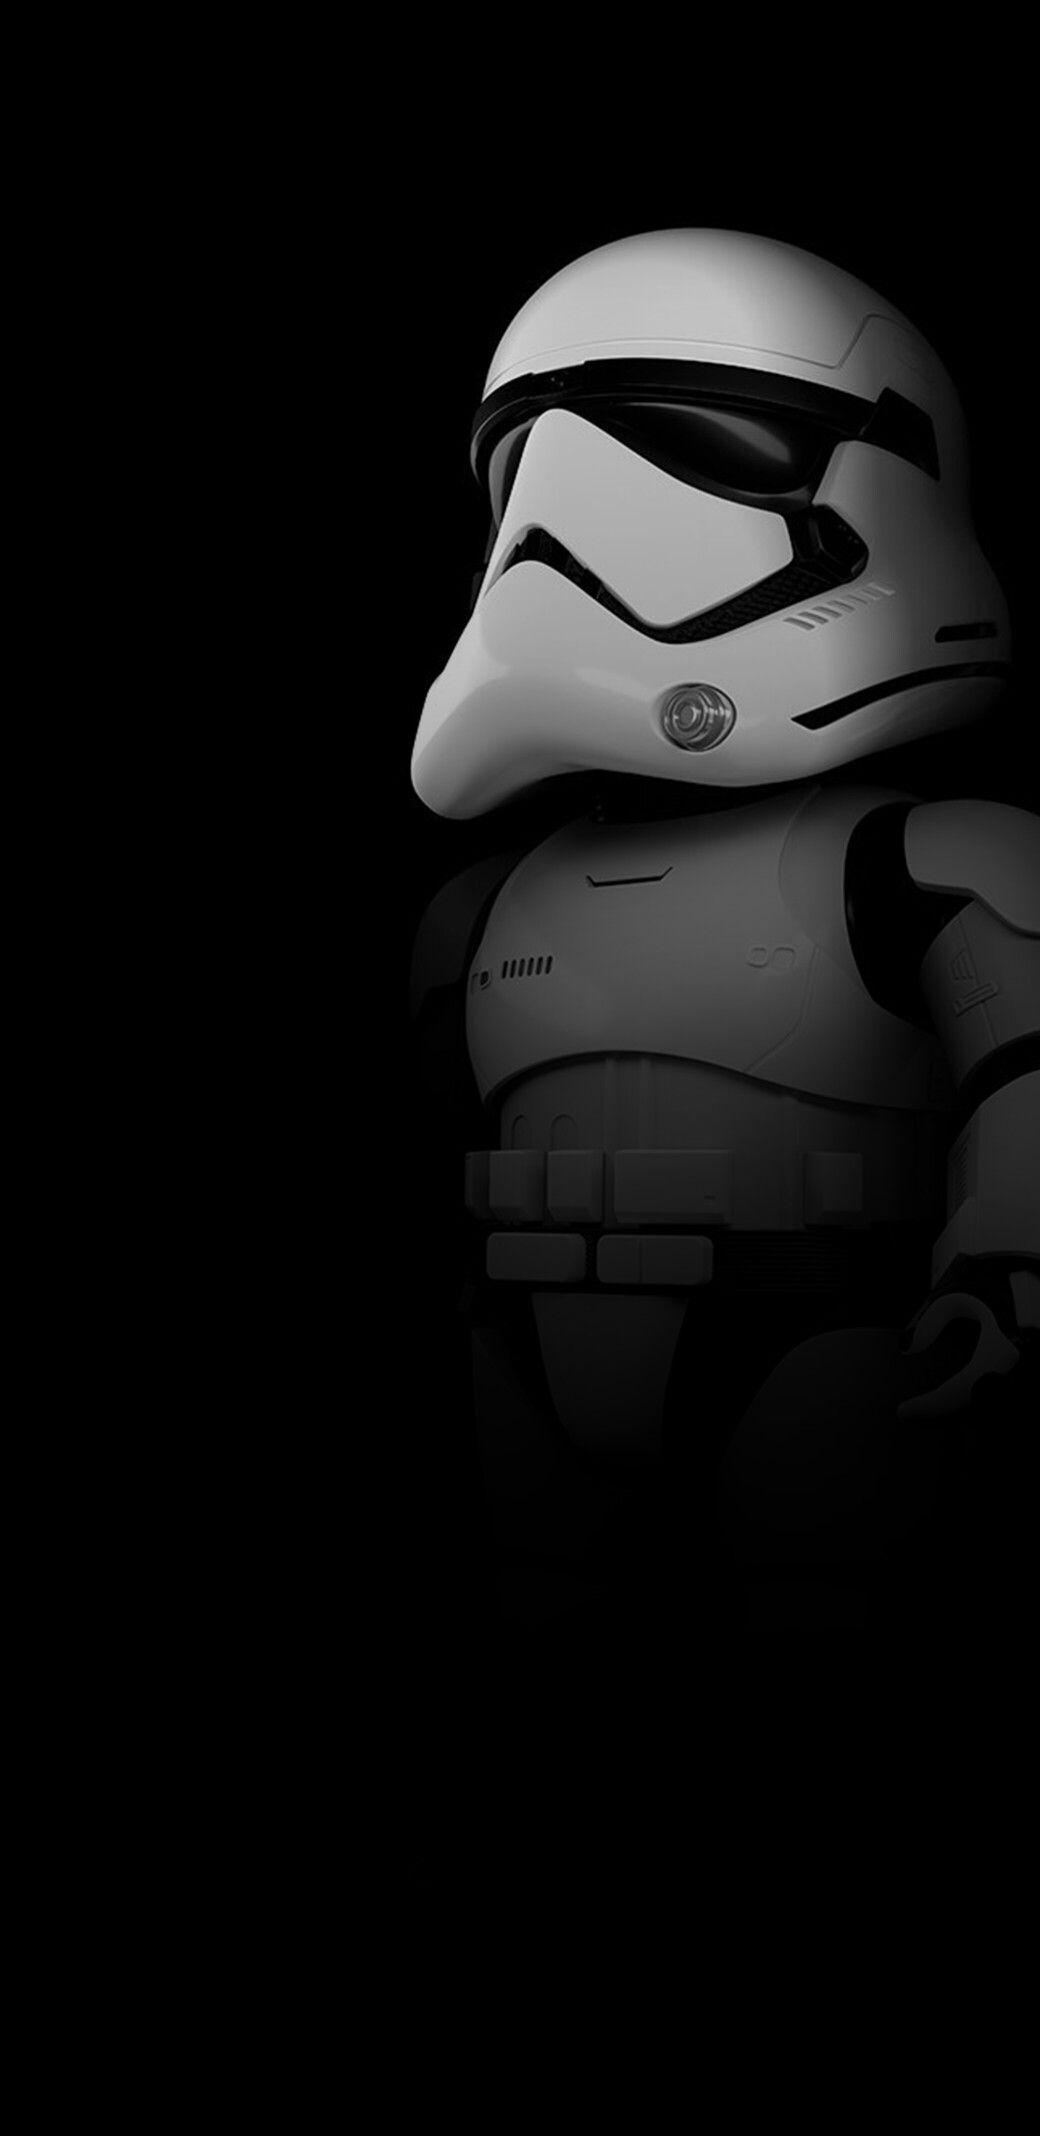 Lego Star Wars Chewbacca Icon : chewbacca, Stormtrooper, Icons,, Helmet